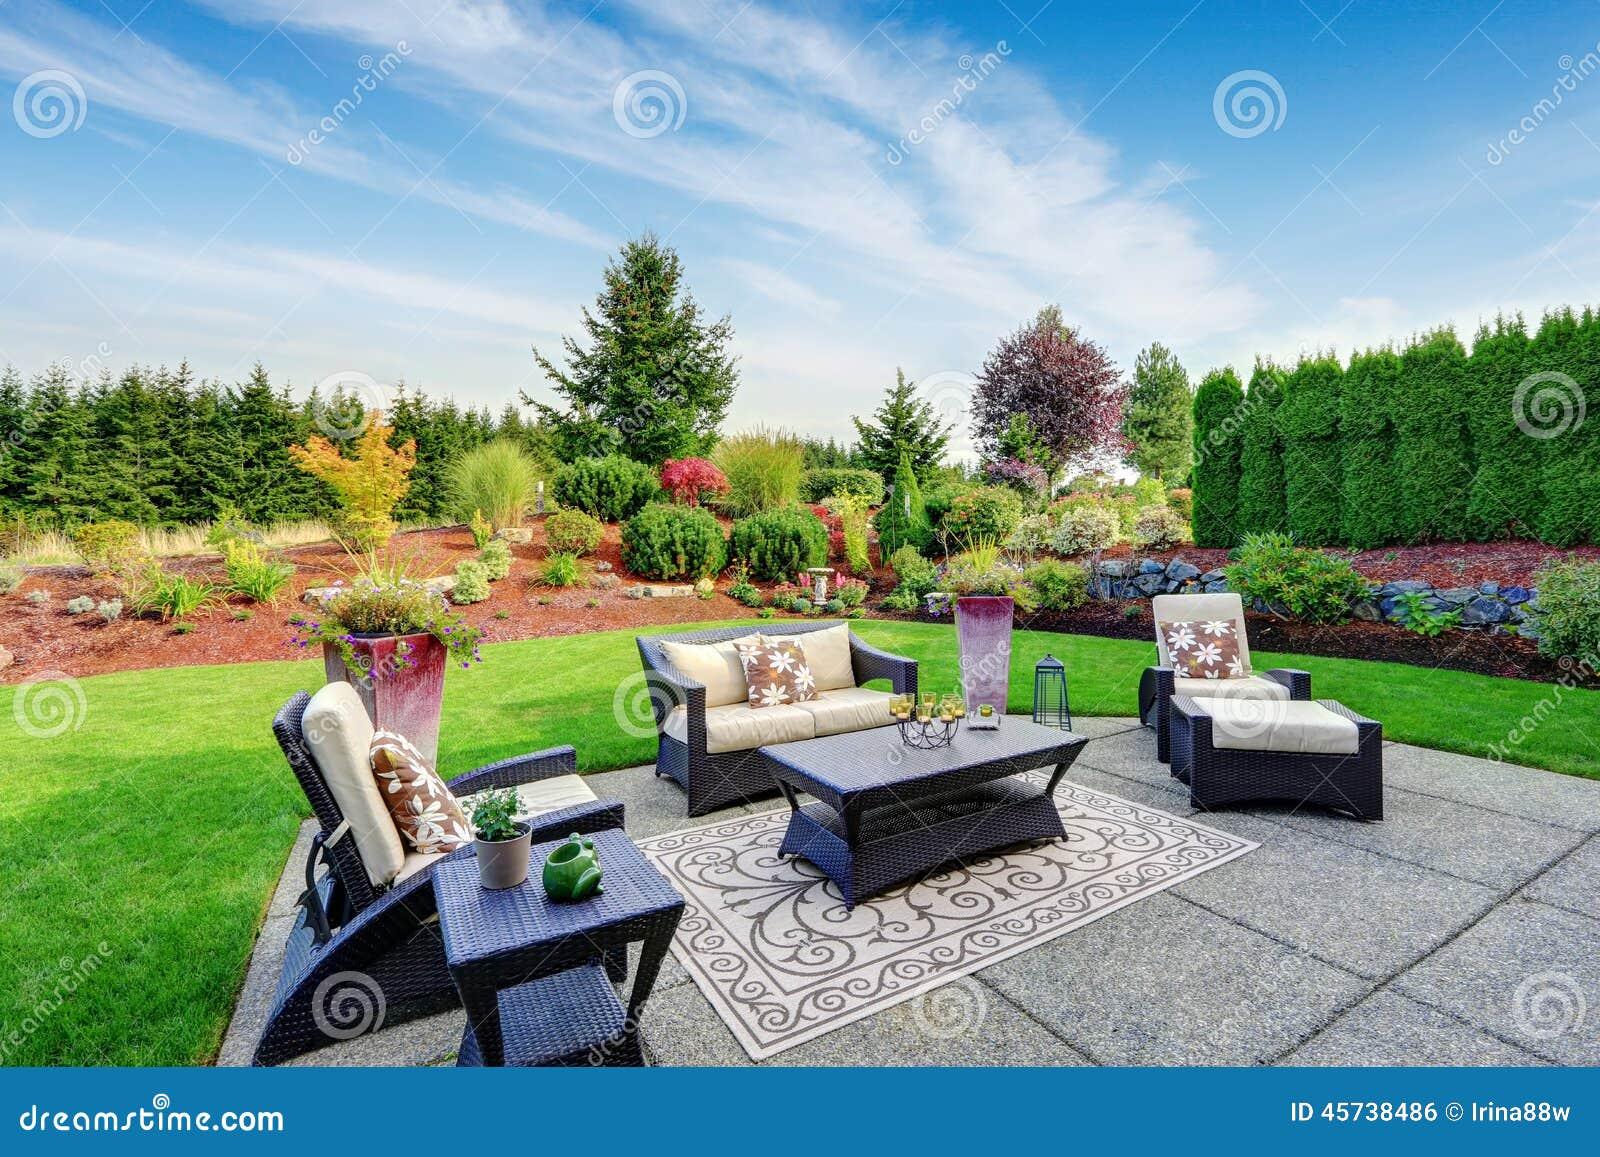 impressive backyard landscape design with patio area stock photo image 45738486. Black Bedroom Furniture Sets. Home Design Ideas